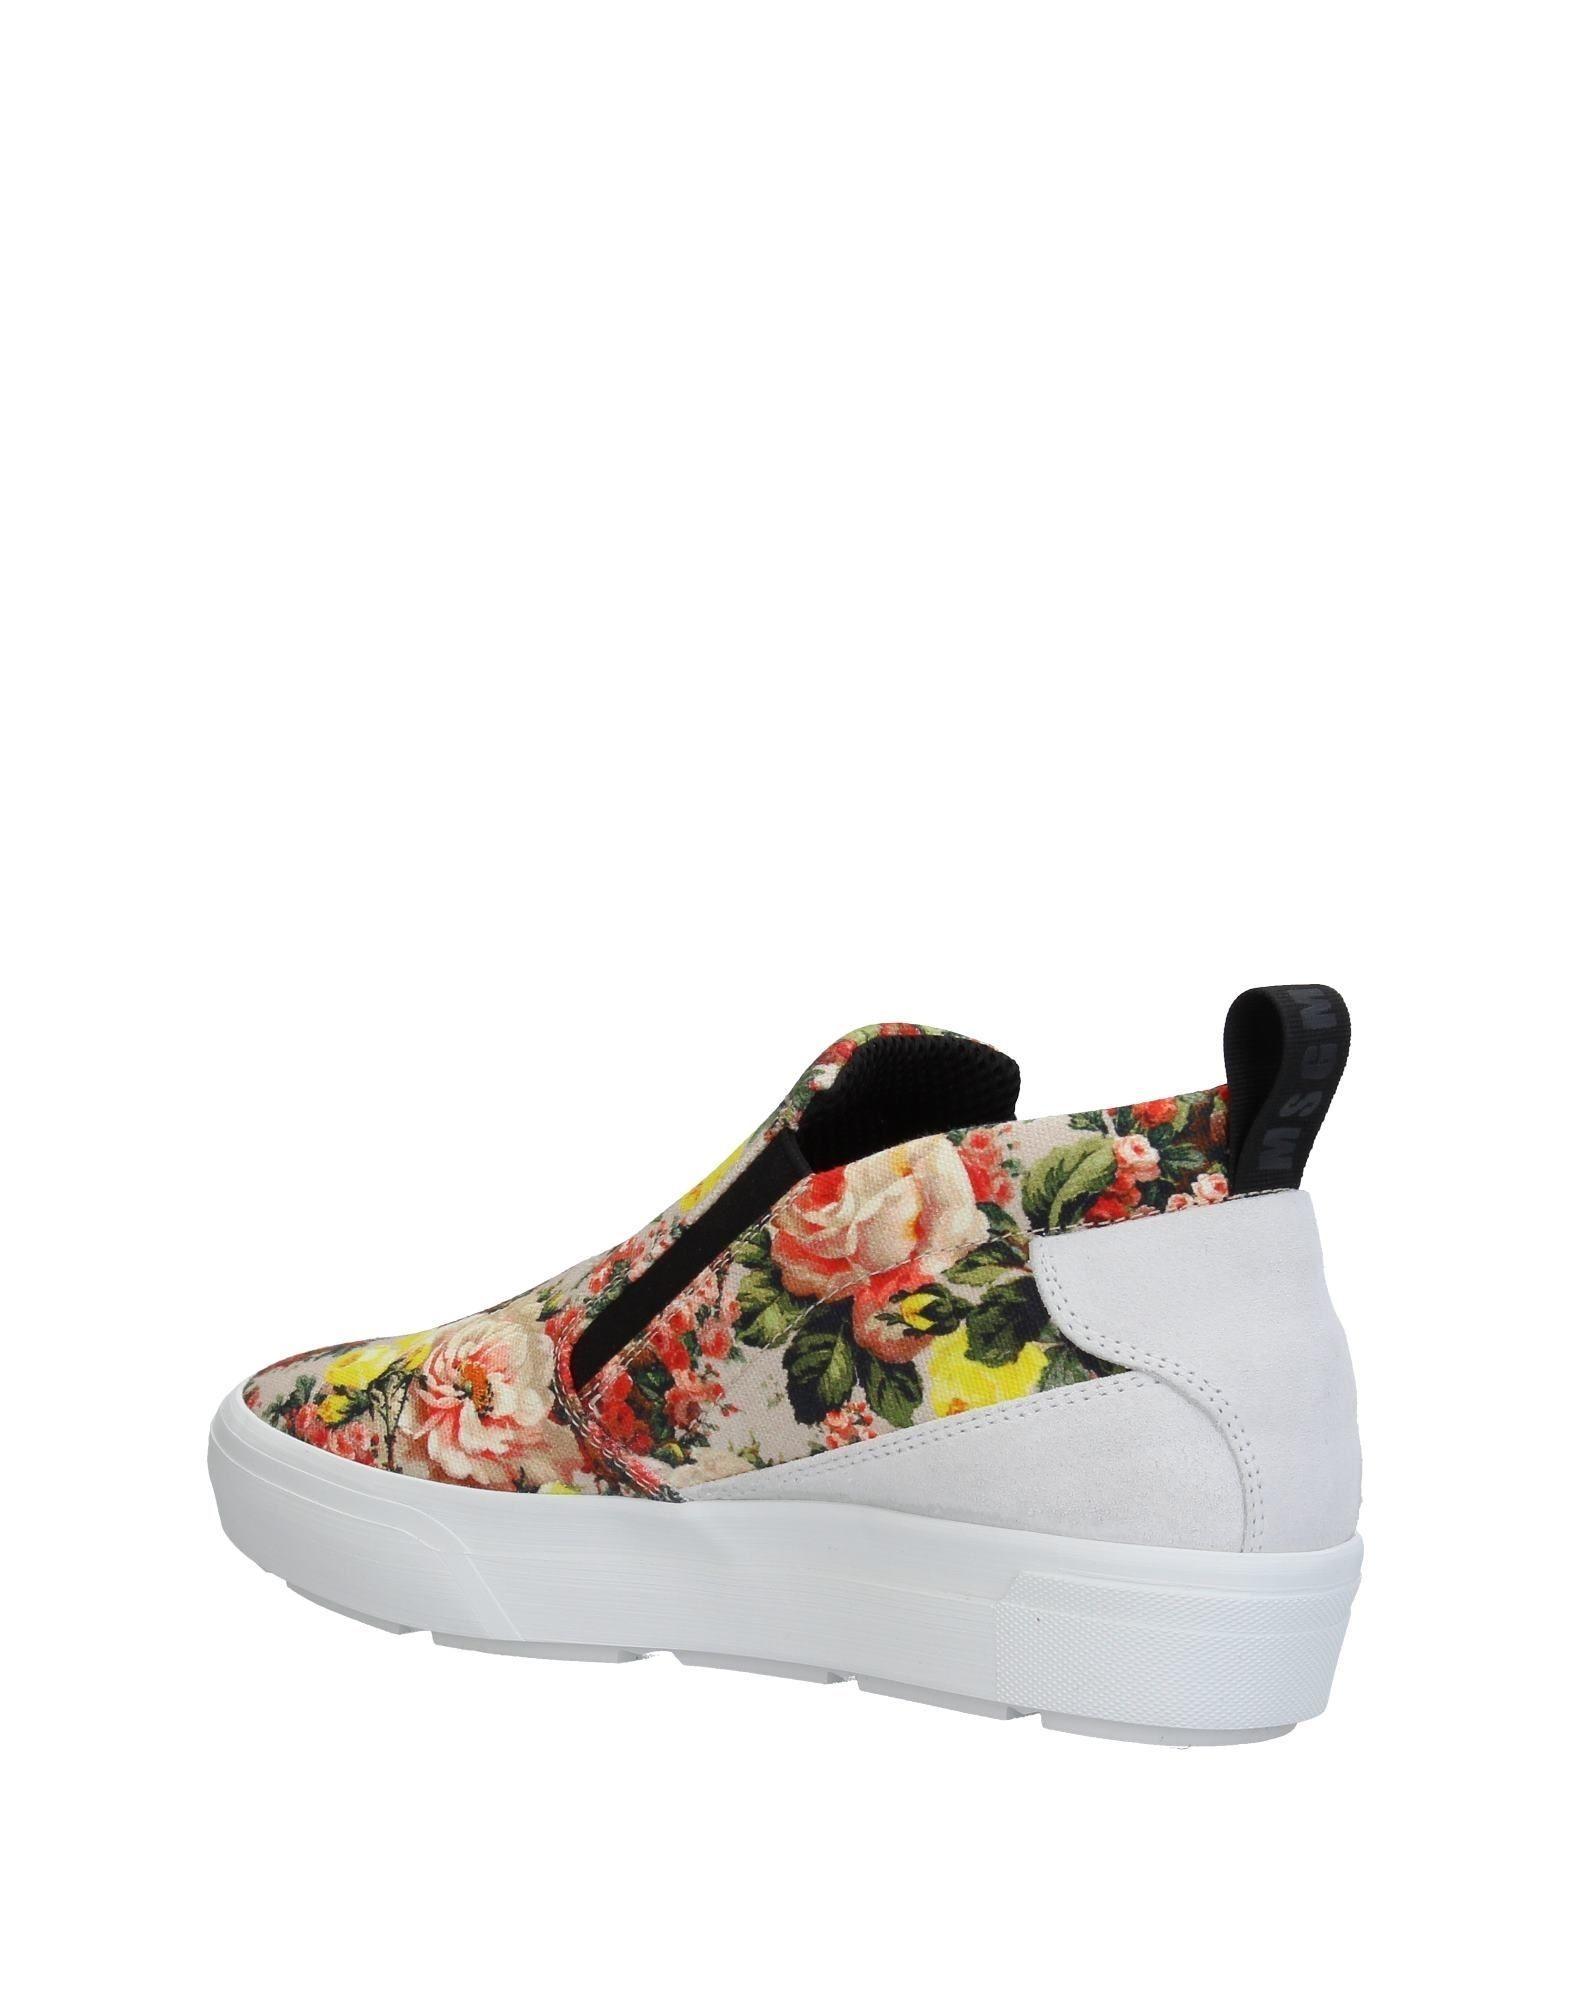 Msgm Sneakers 11380900PX Damen  11380900PX Sneakers Heiße Schuhe 86c8dc